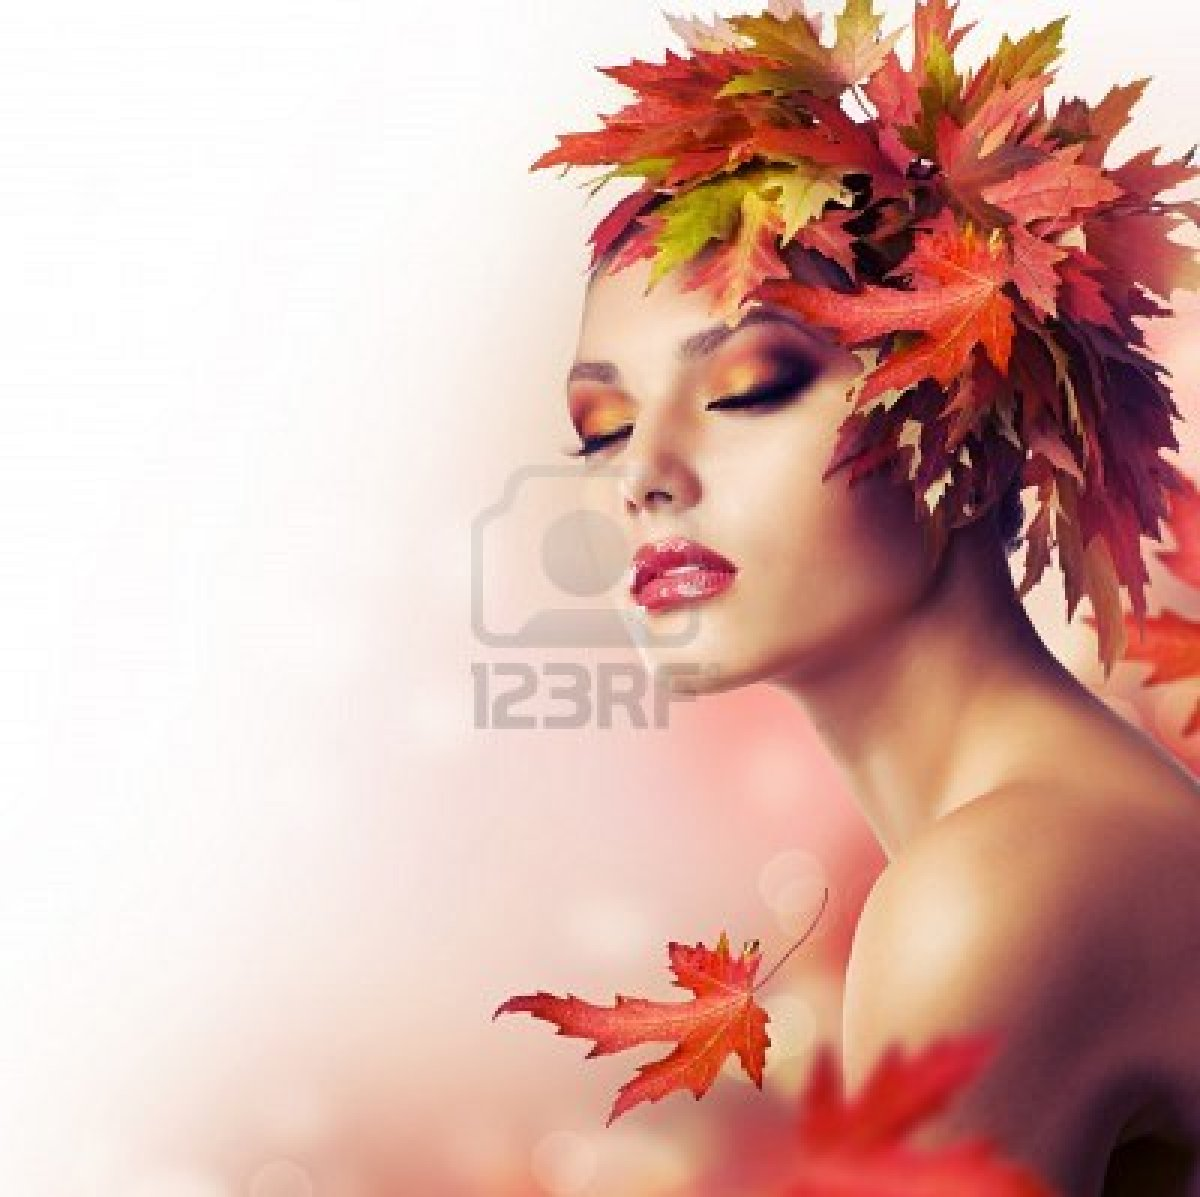 Beauty 2 Fashion: Girly Girls: Herfst Make-up Inspiratie